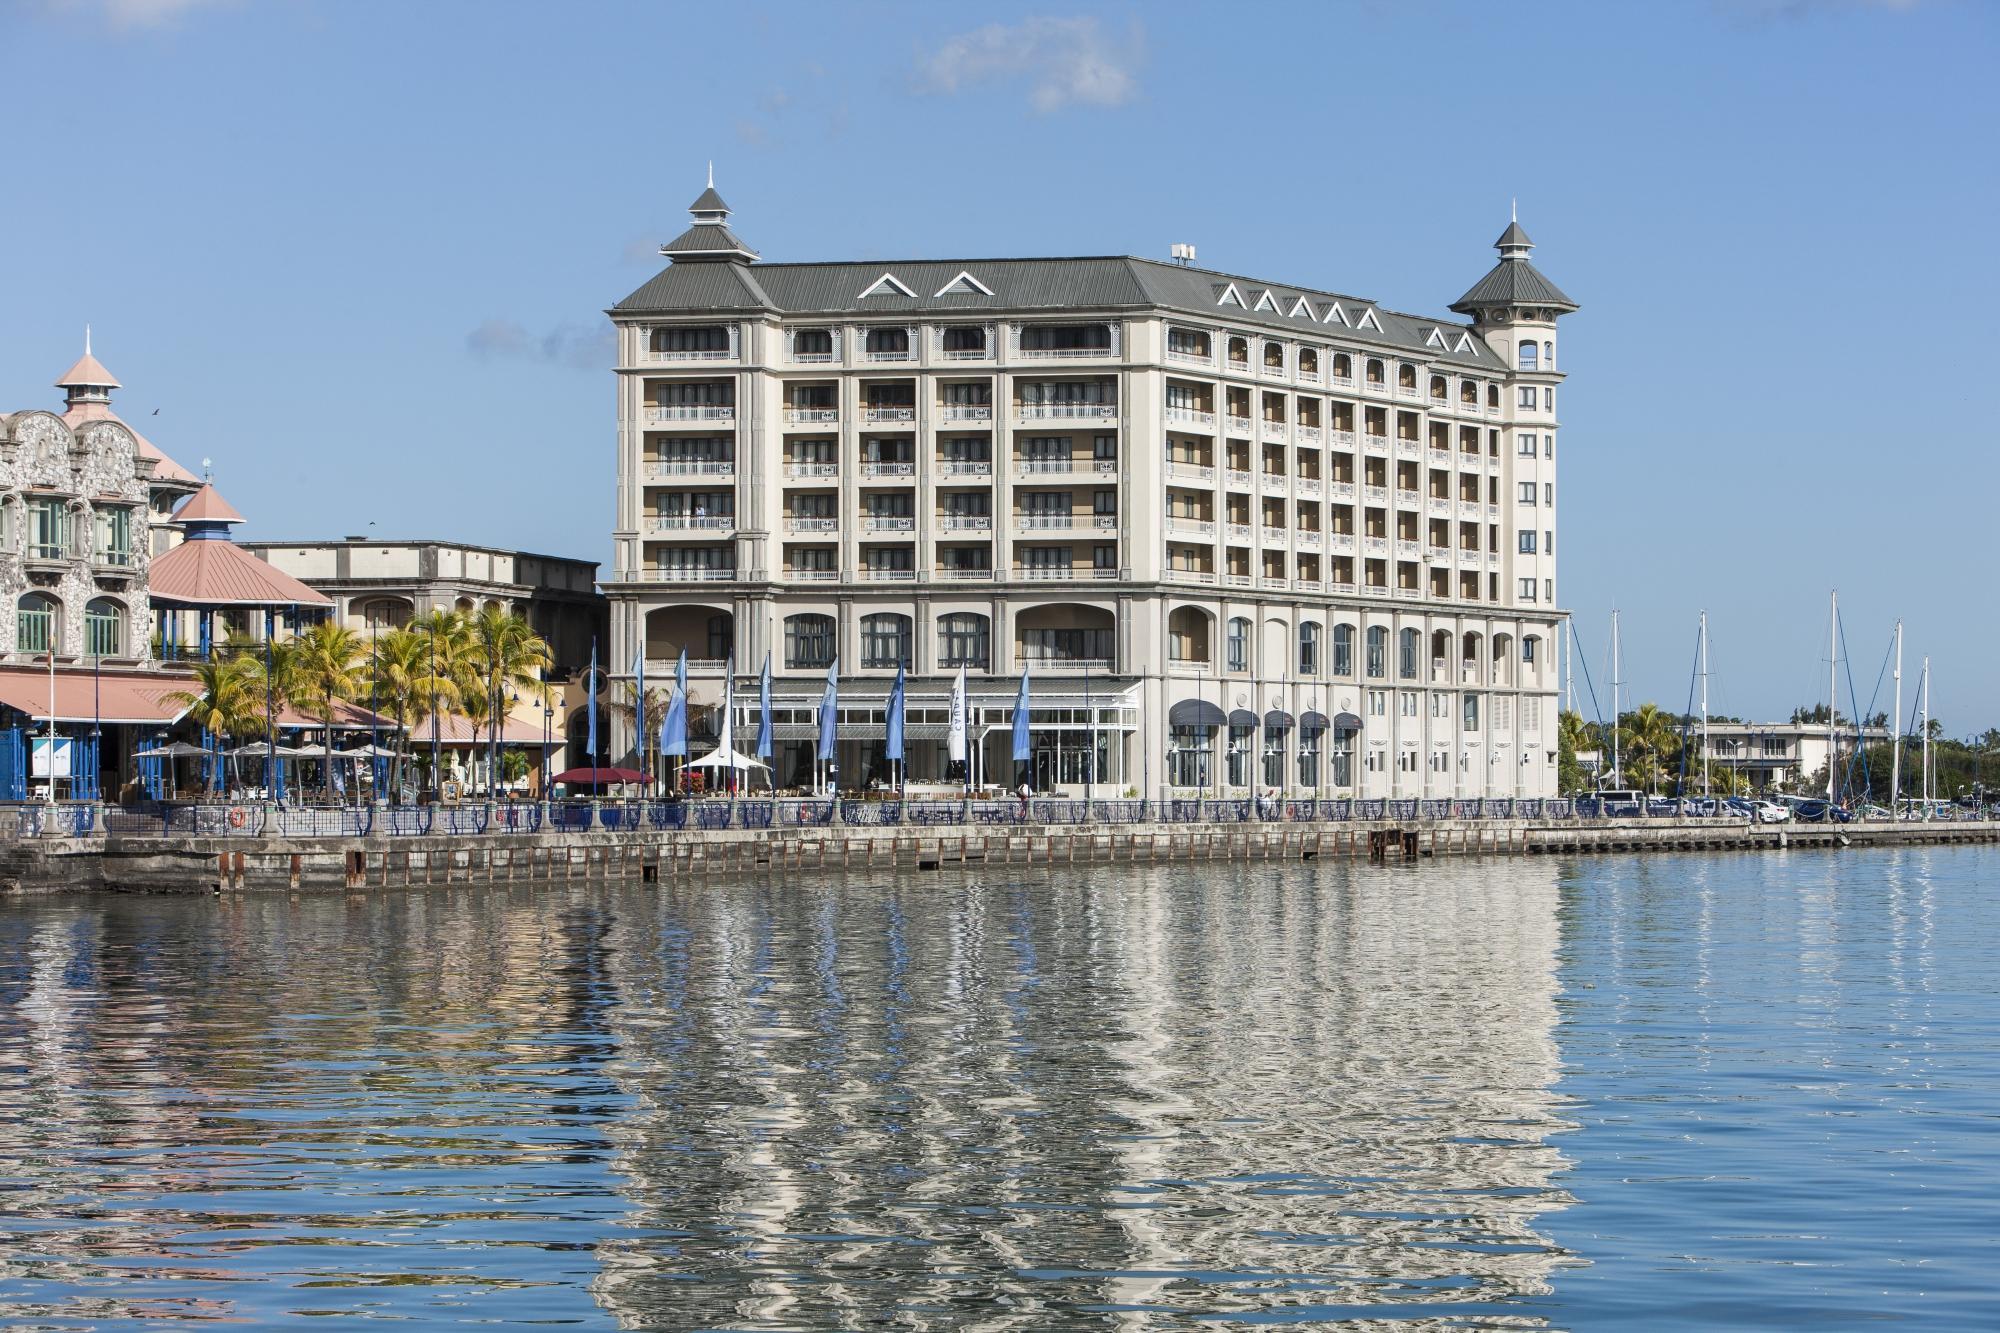 labourdonnais-waterfront-1.jpg